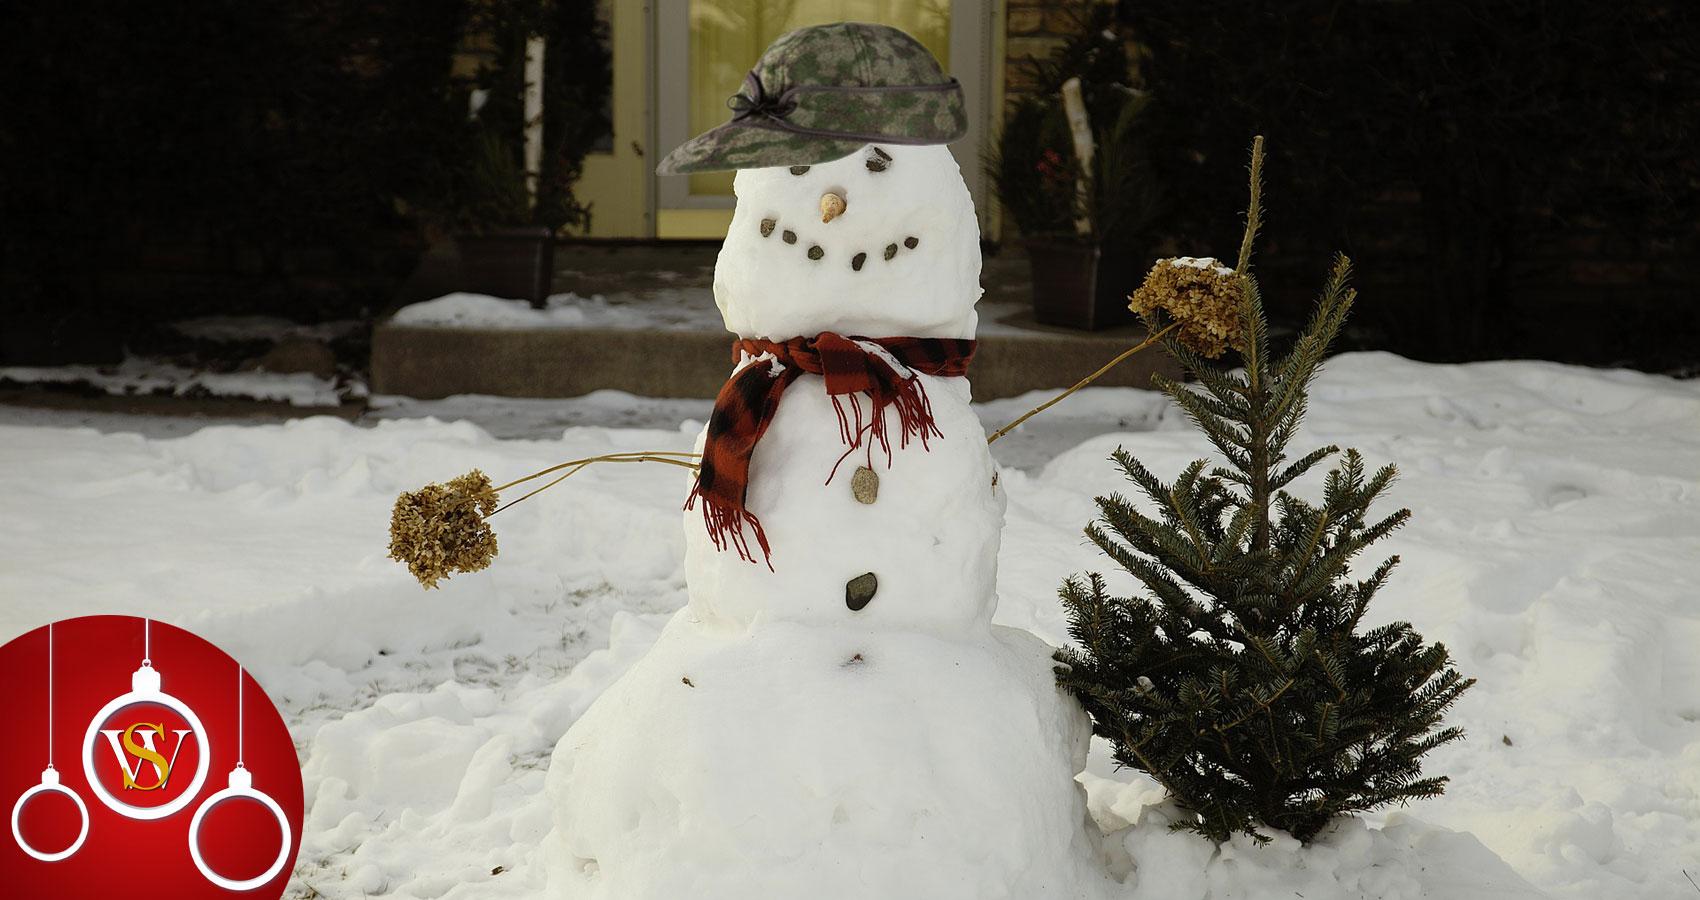 The Snowman written by James Gabriel at Spillwords.com